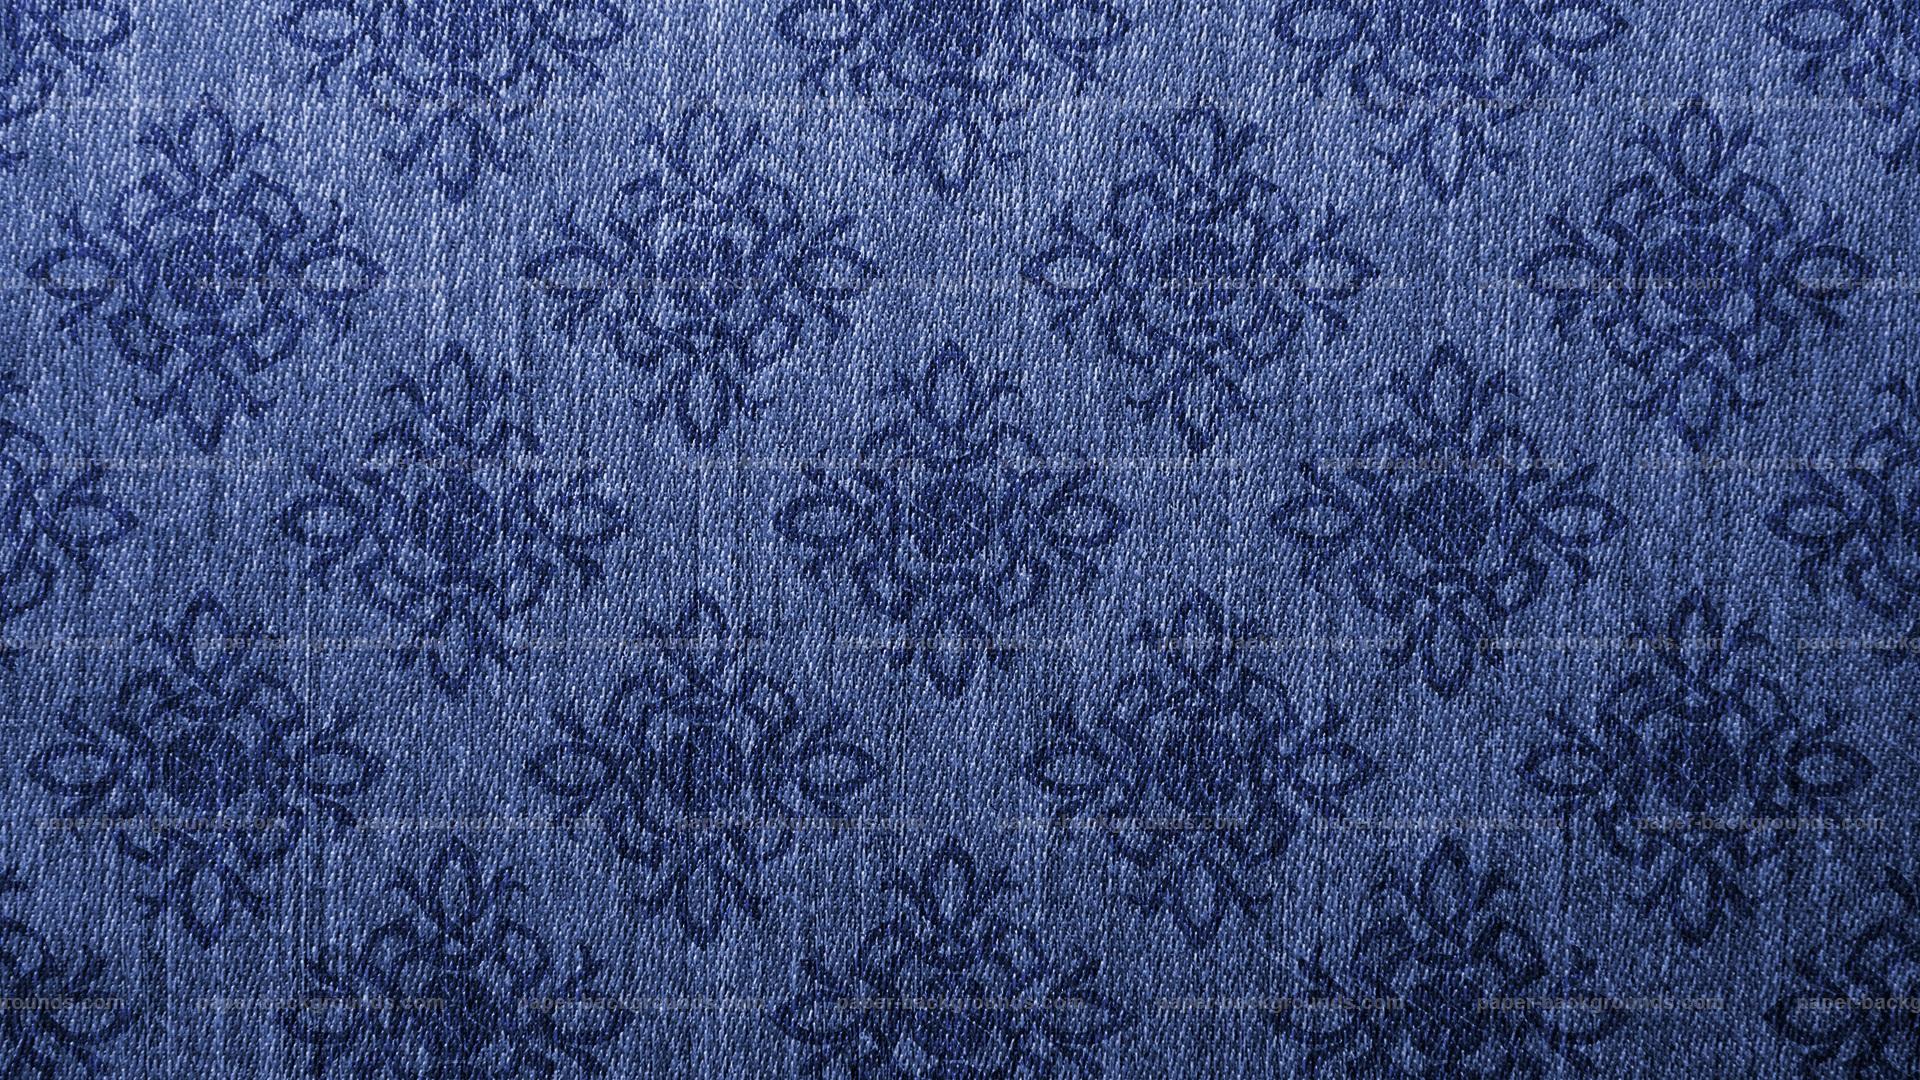 texture background blue canvas vintage damask ground back 1920x1080